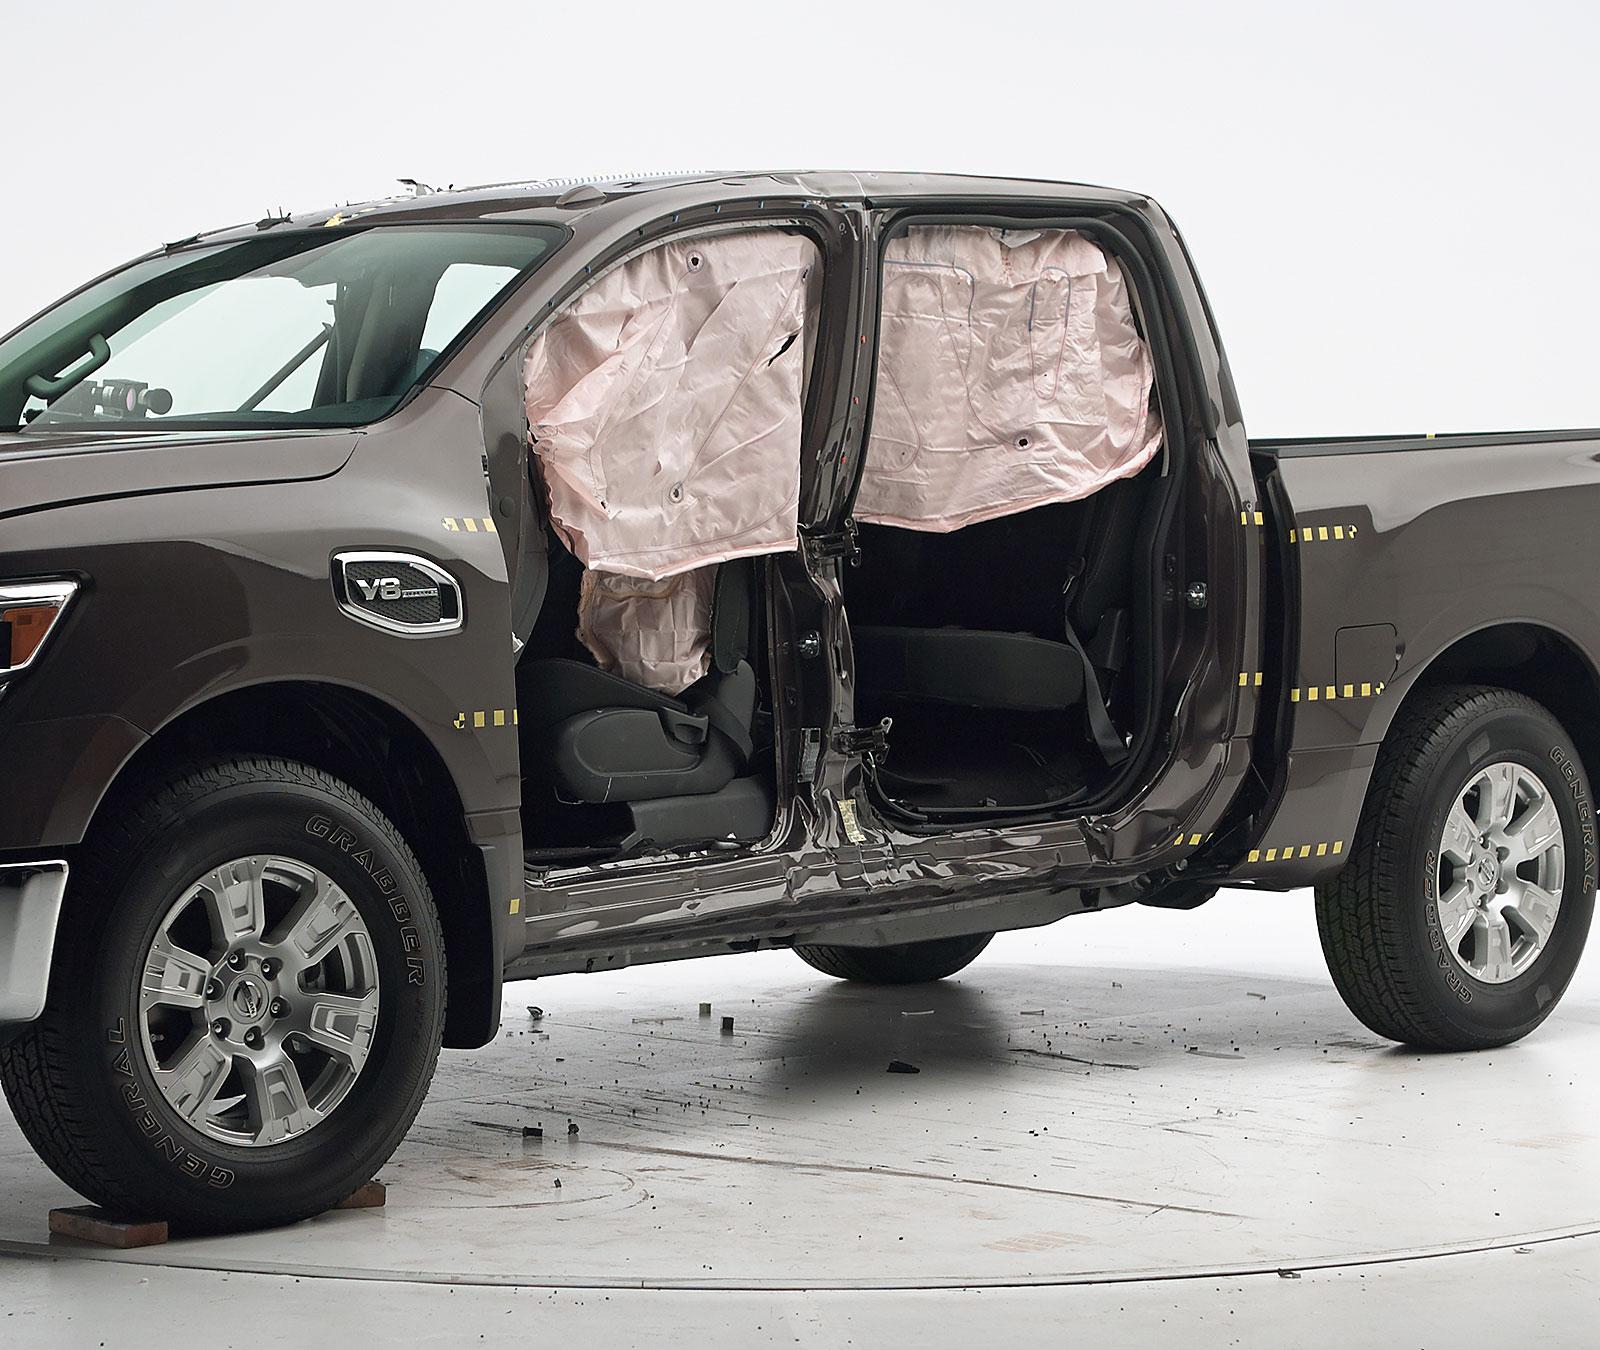 2019 Nissan Titan: 2019 Nissan Titan